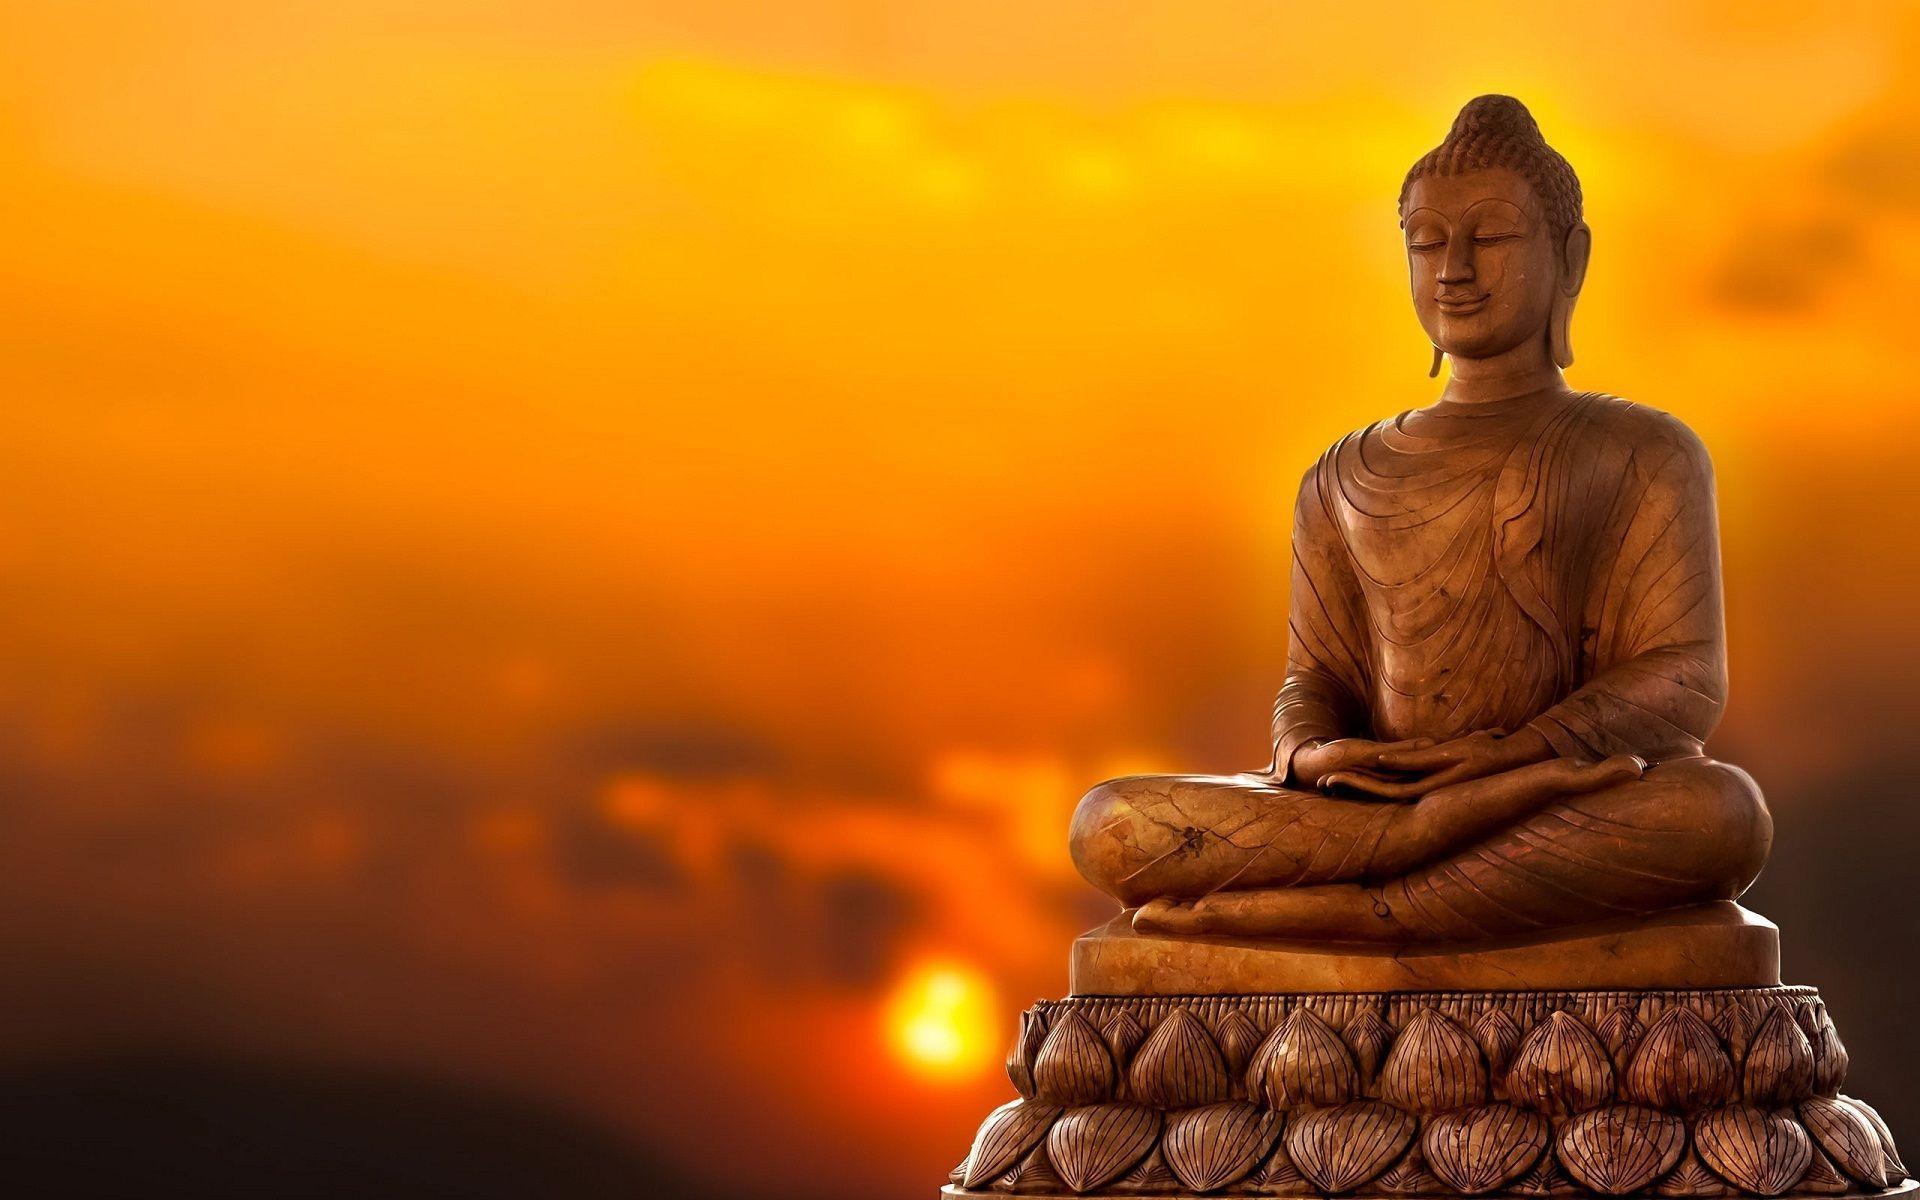 Gautam Buddha Full Hd Wallpapers: Buddha Desktop Wallpapers